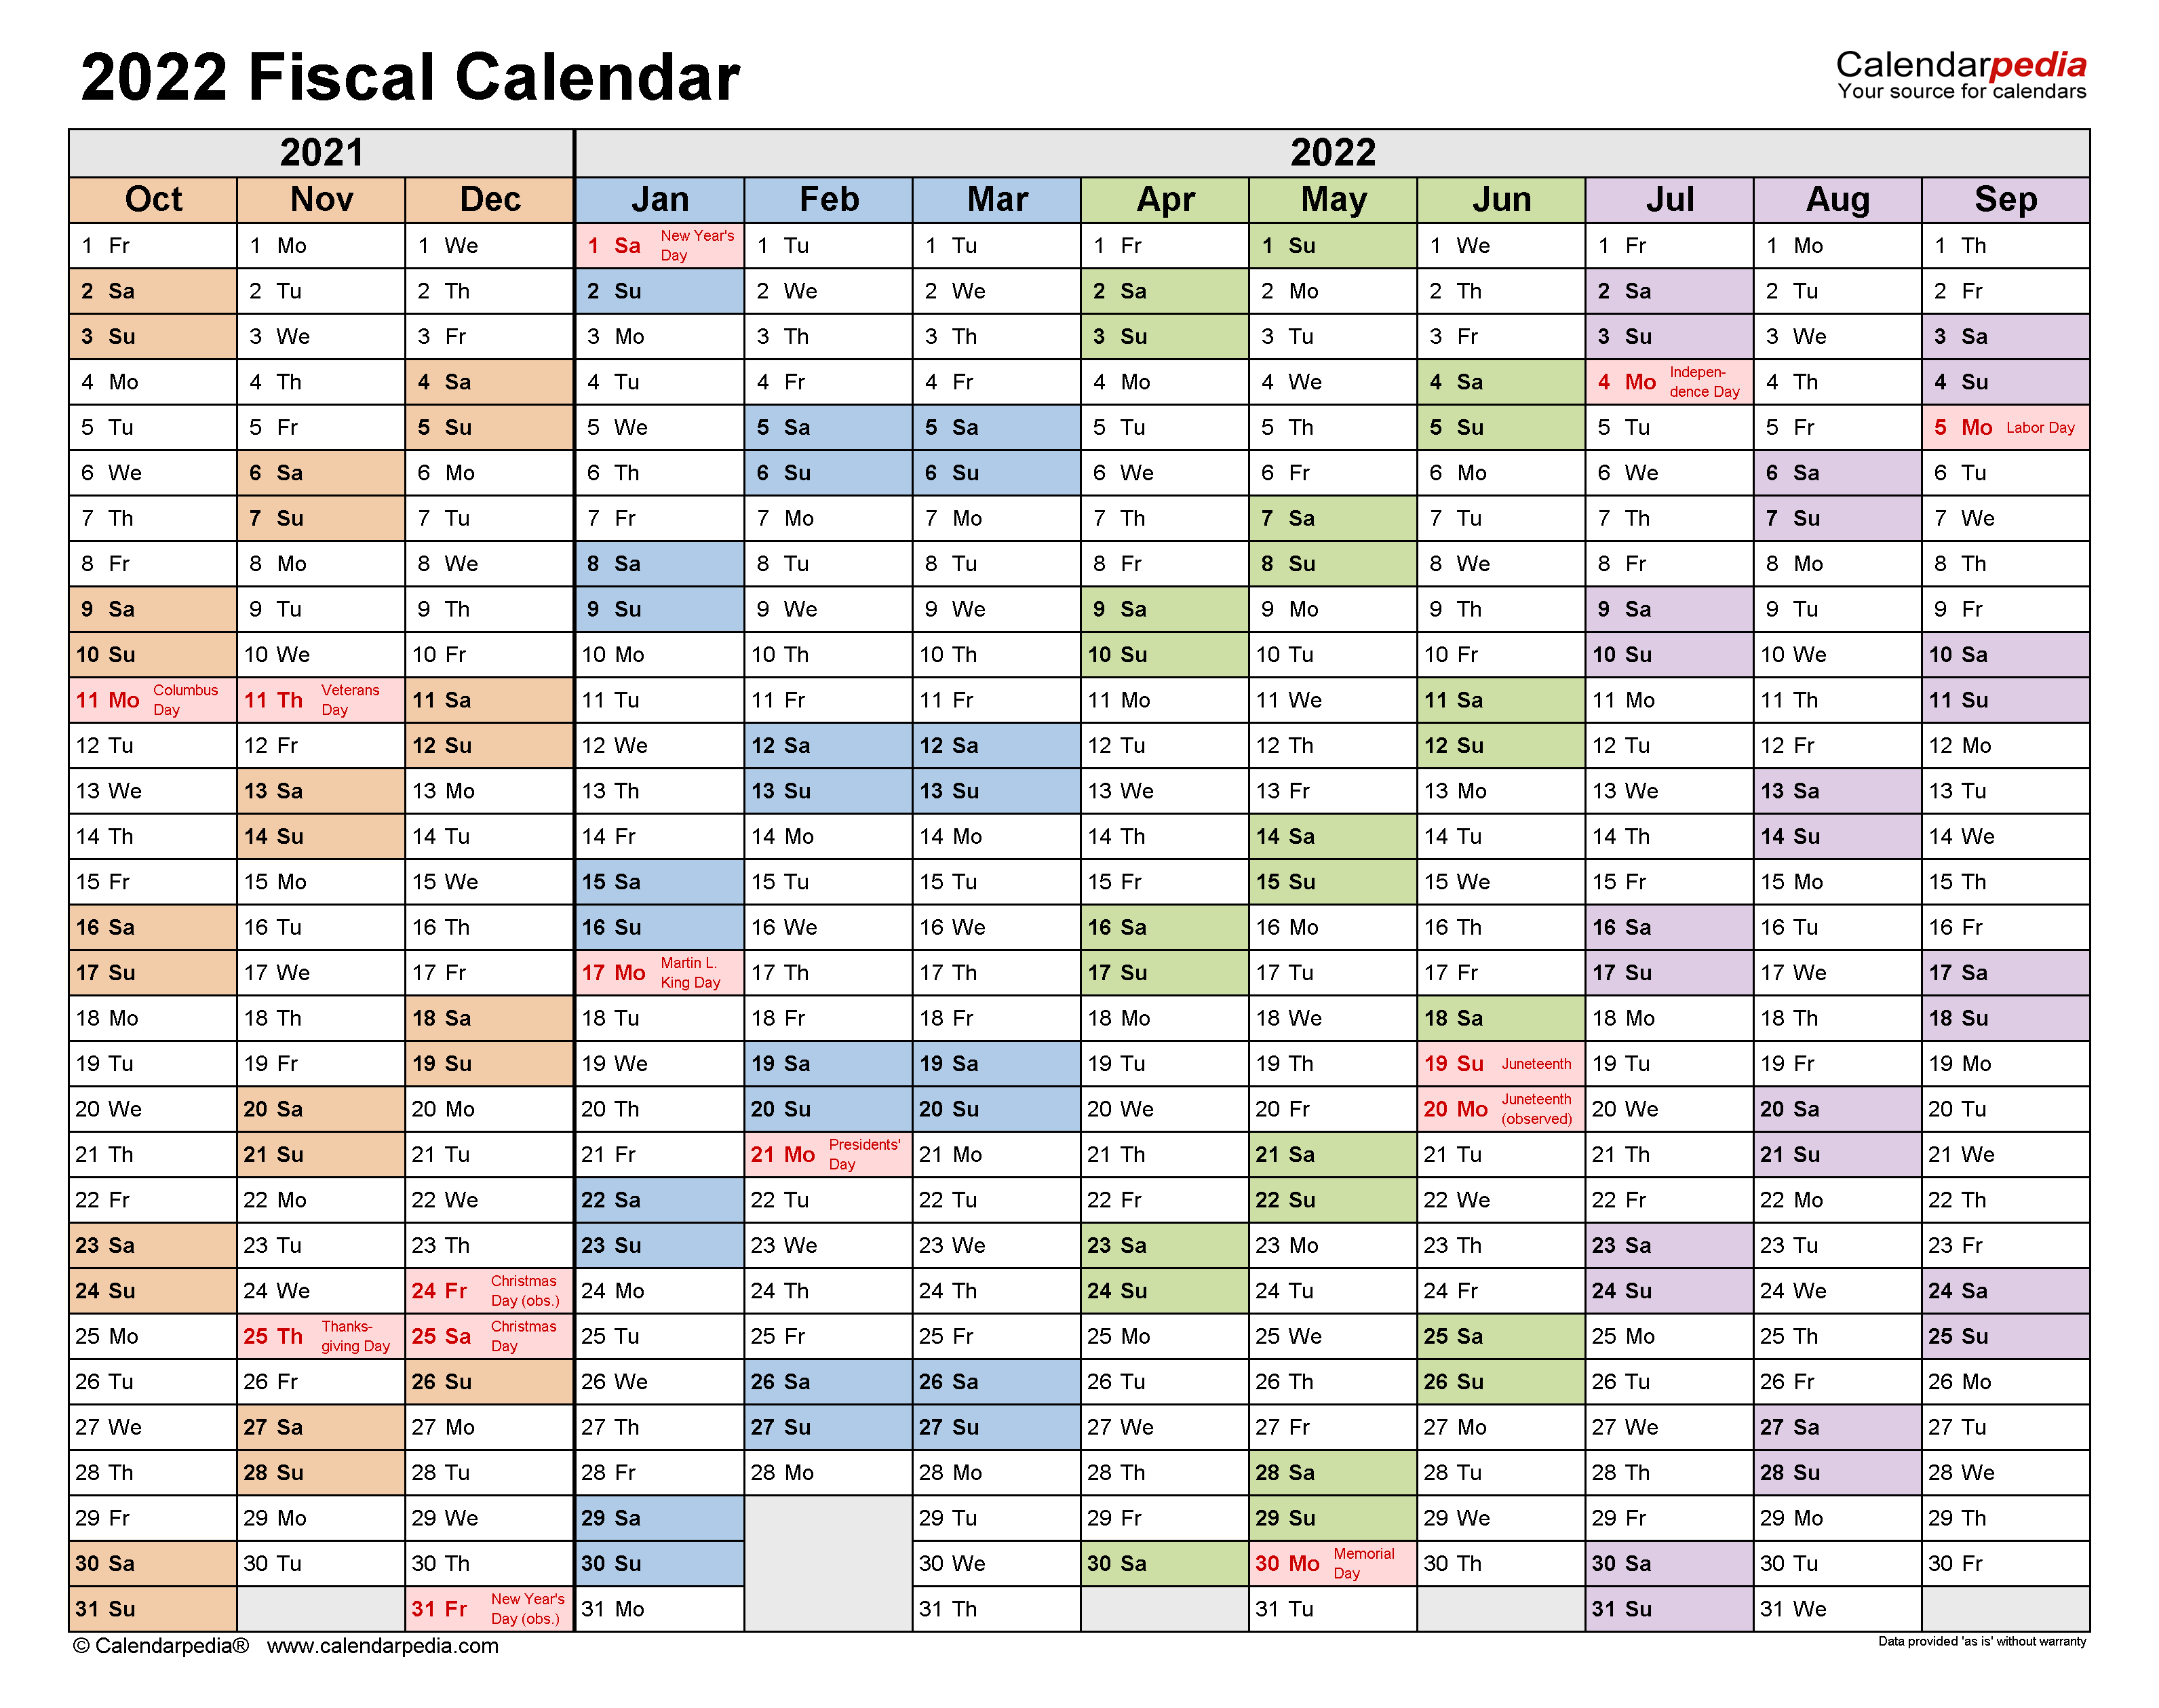 Season Finales 2022 Calendar.Fiscal Calendars 2022 Free Printable Pdf Templates